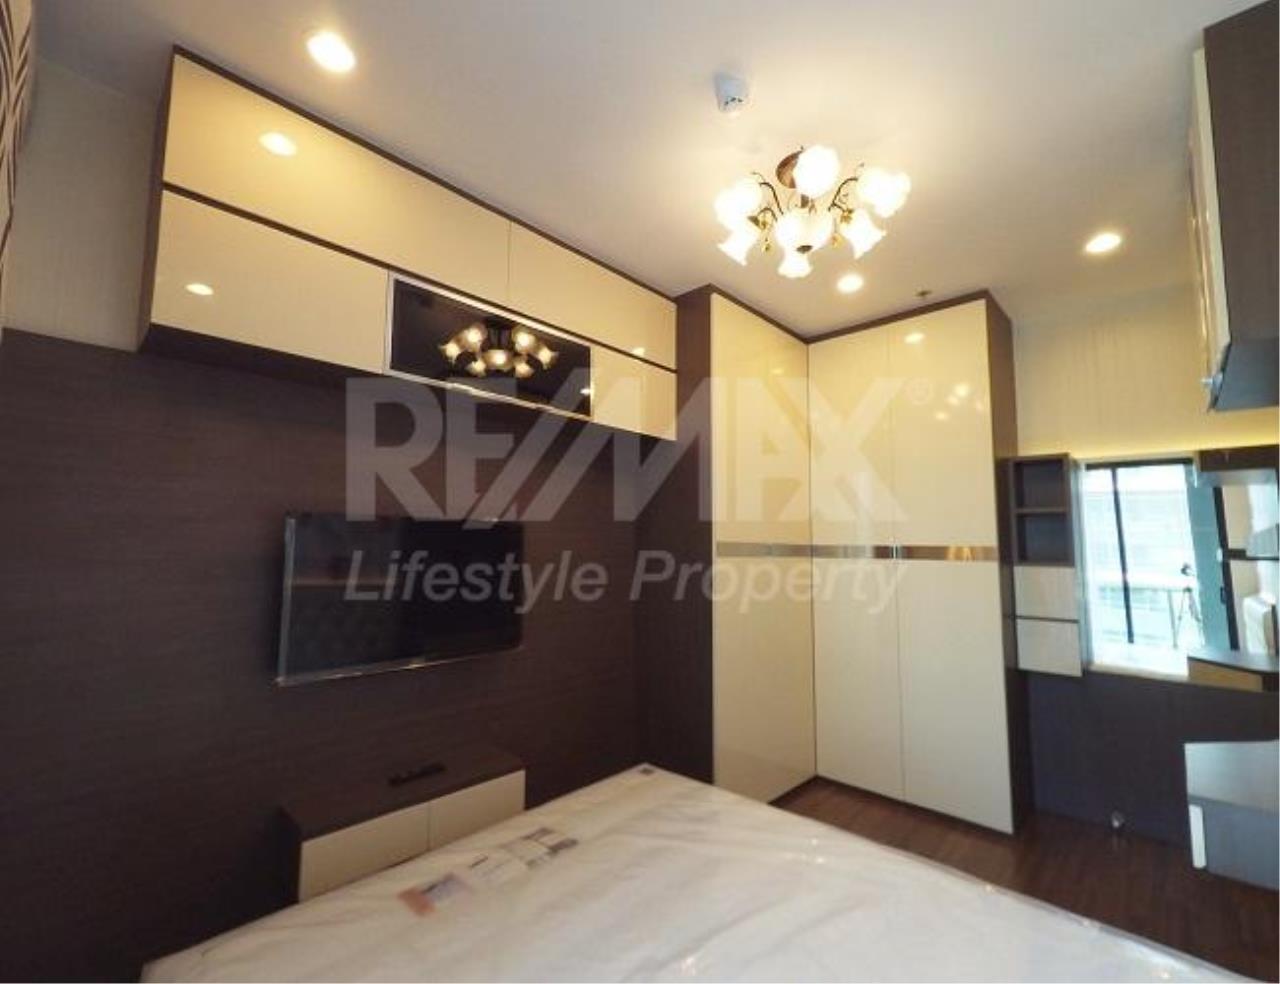 RE/MAX LifeStyle Property Agency's Supalai Premier @ Asoke 3